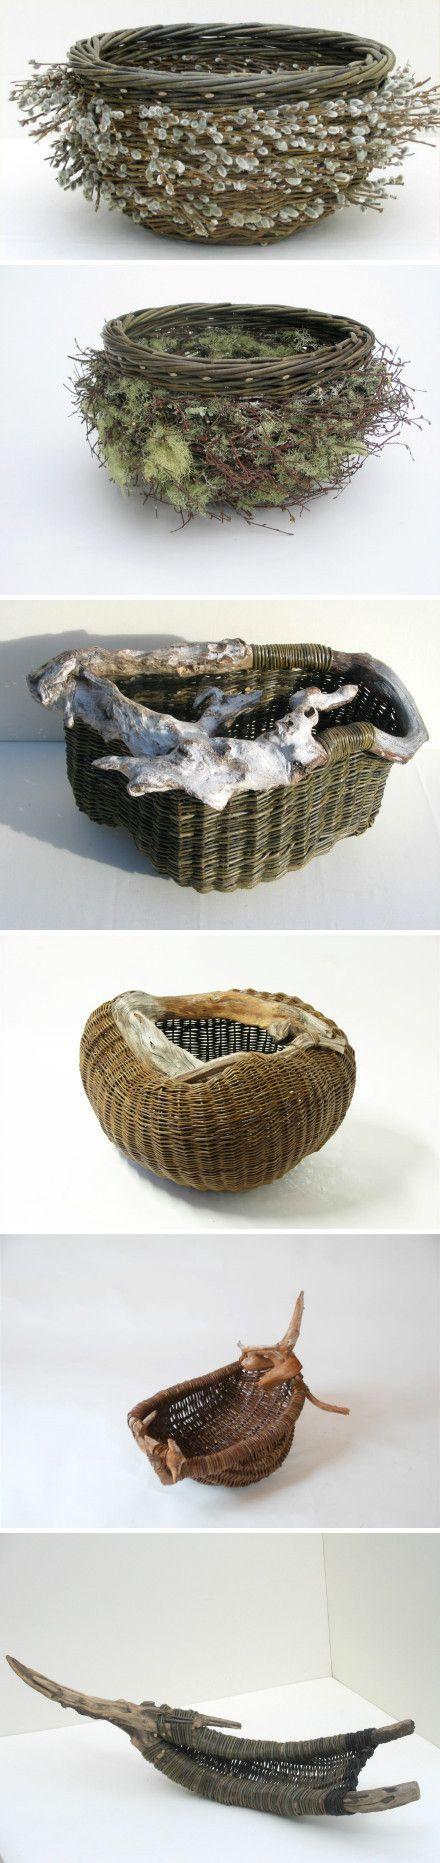 Joe Hogan Basket Maker – Traditional Irish Willow Baskets